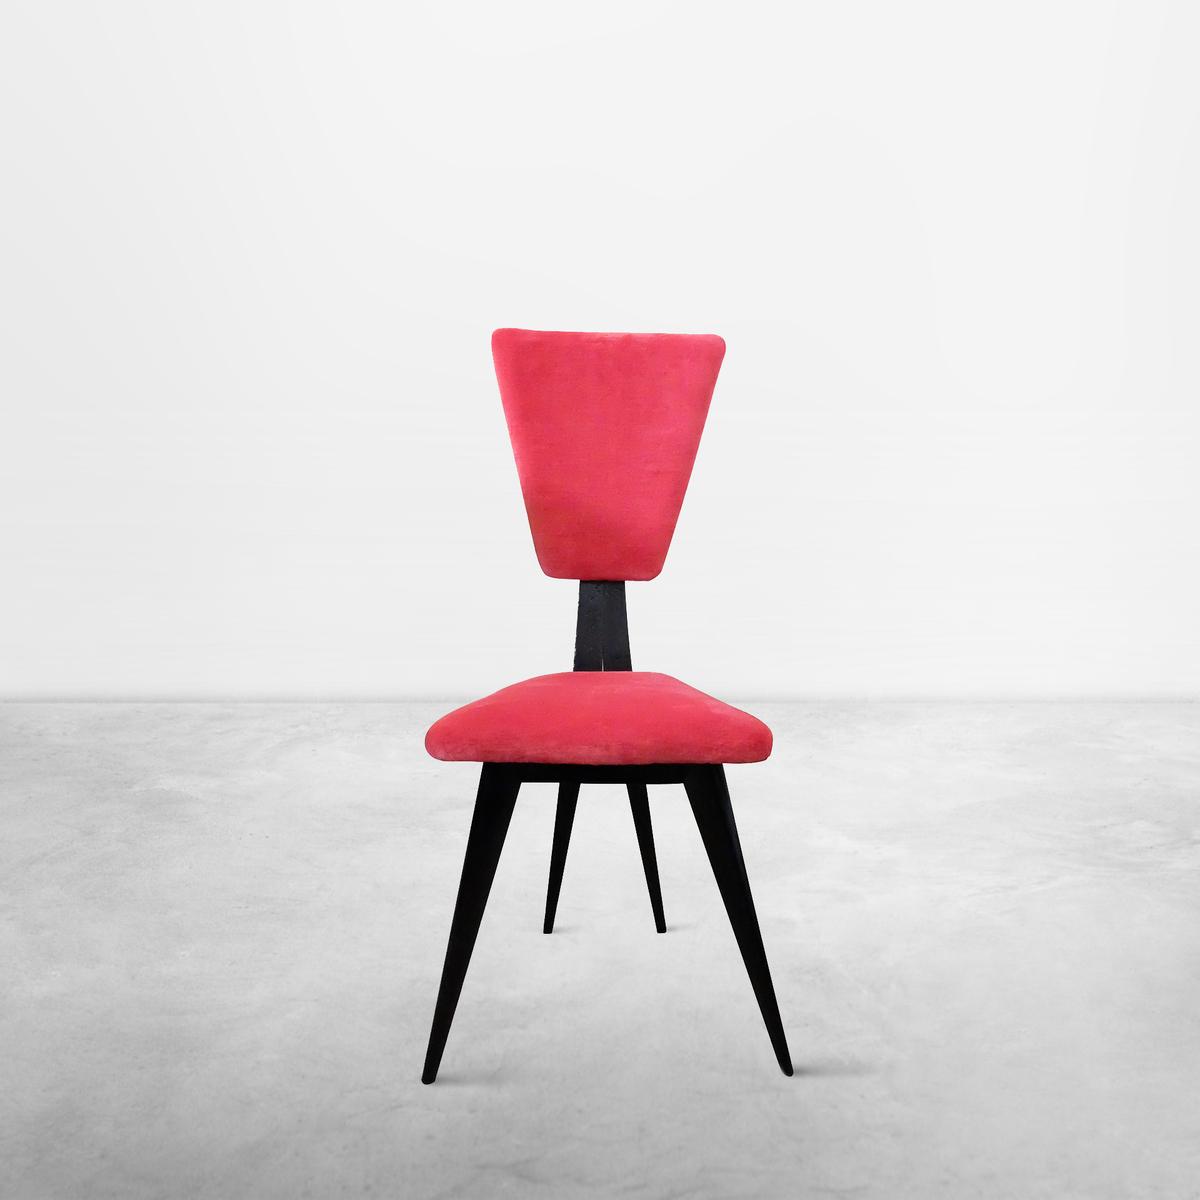 Italian Mid-Century set of two Red Velvet Chairs, 1950s